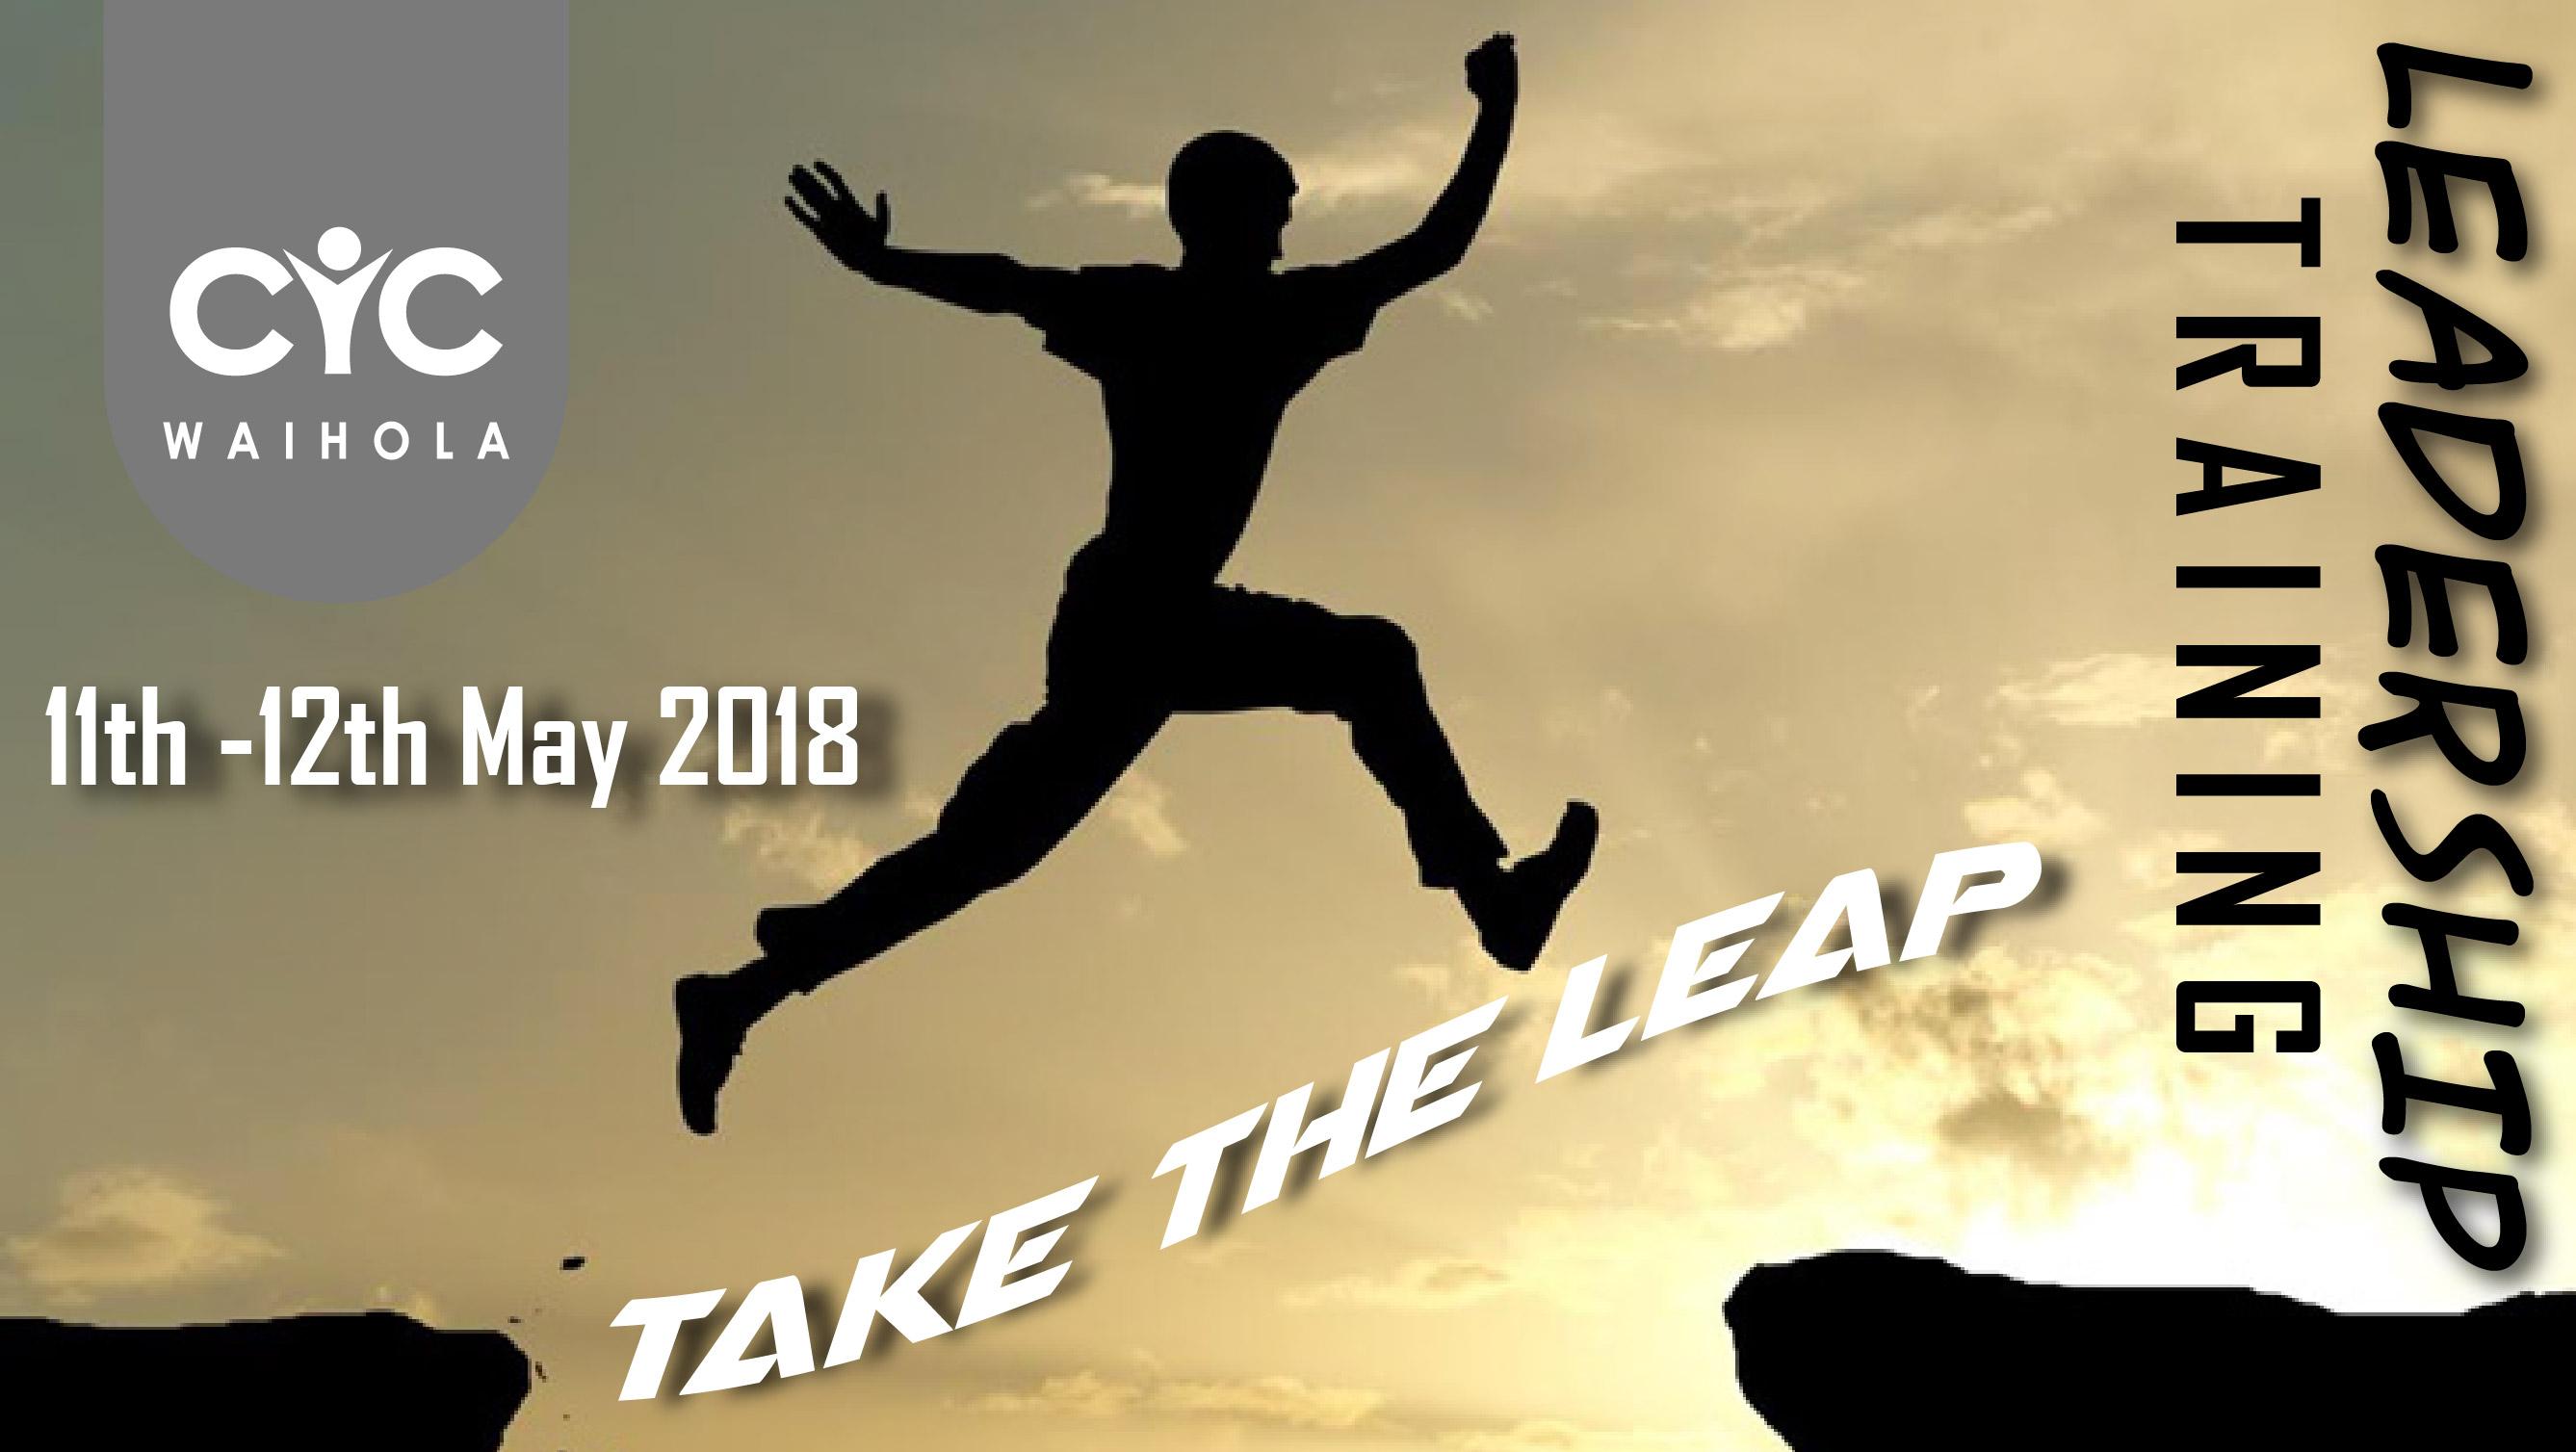 Leadership Training Weekend 11th – 12th May 2018